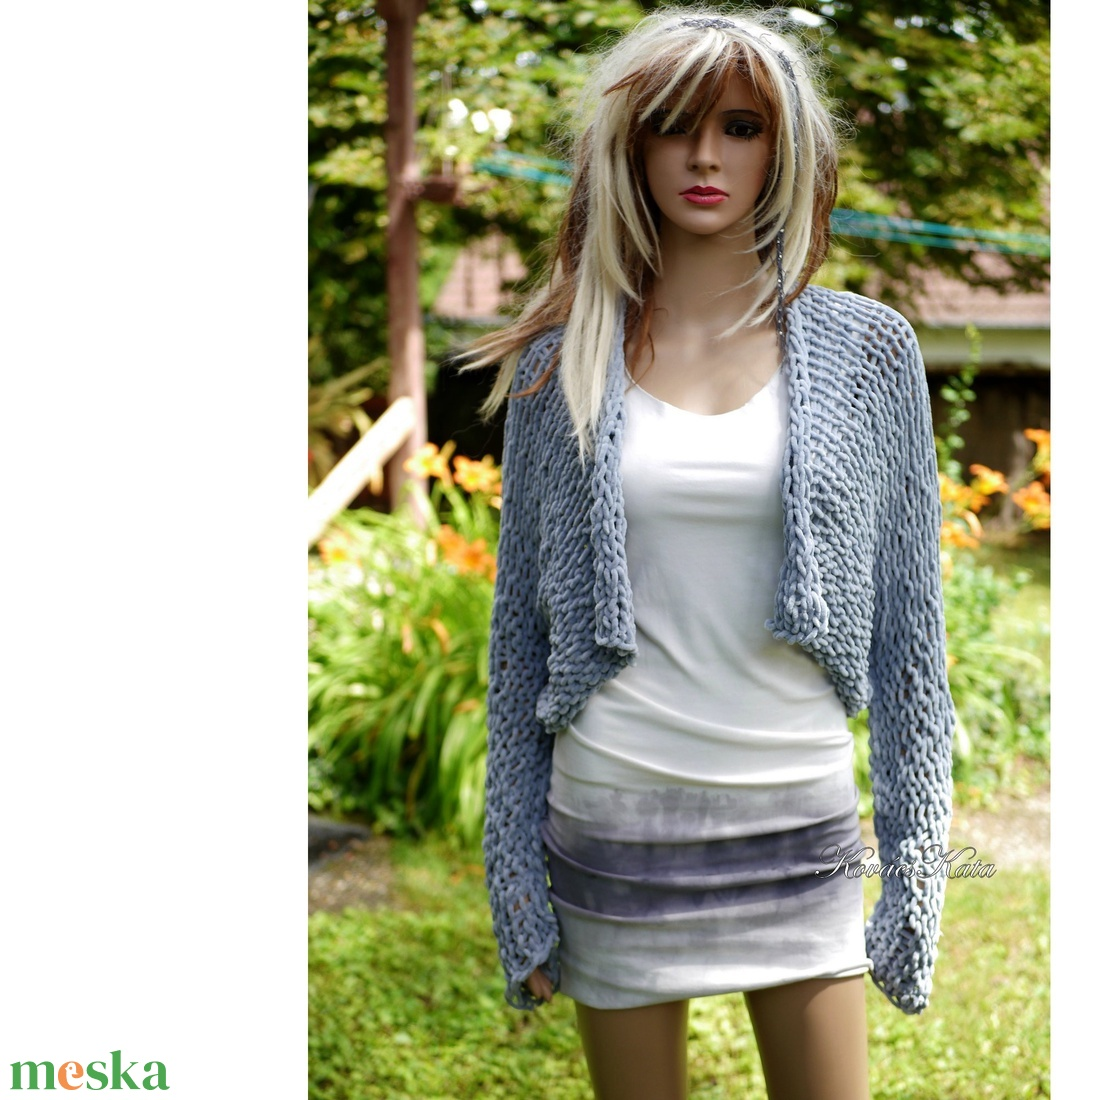 TRIKÓRUHA - bohém batikolt trikóruha  - ruha & divat - női ruha - ruha - Meska.hu